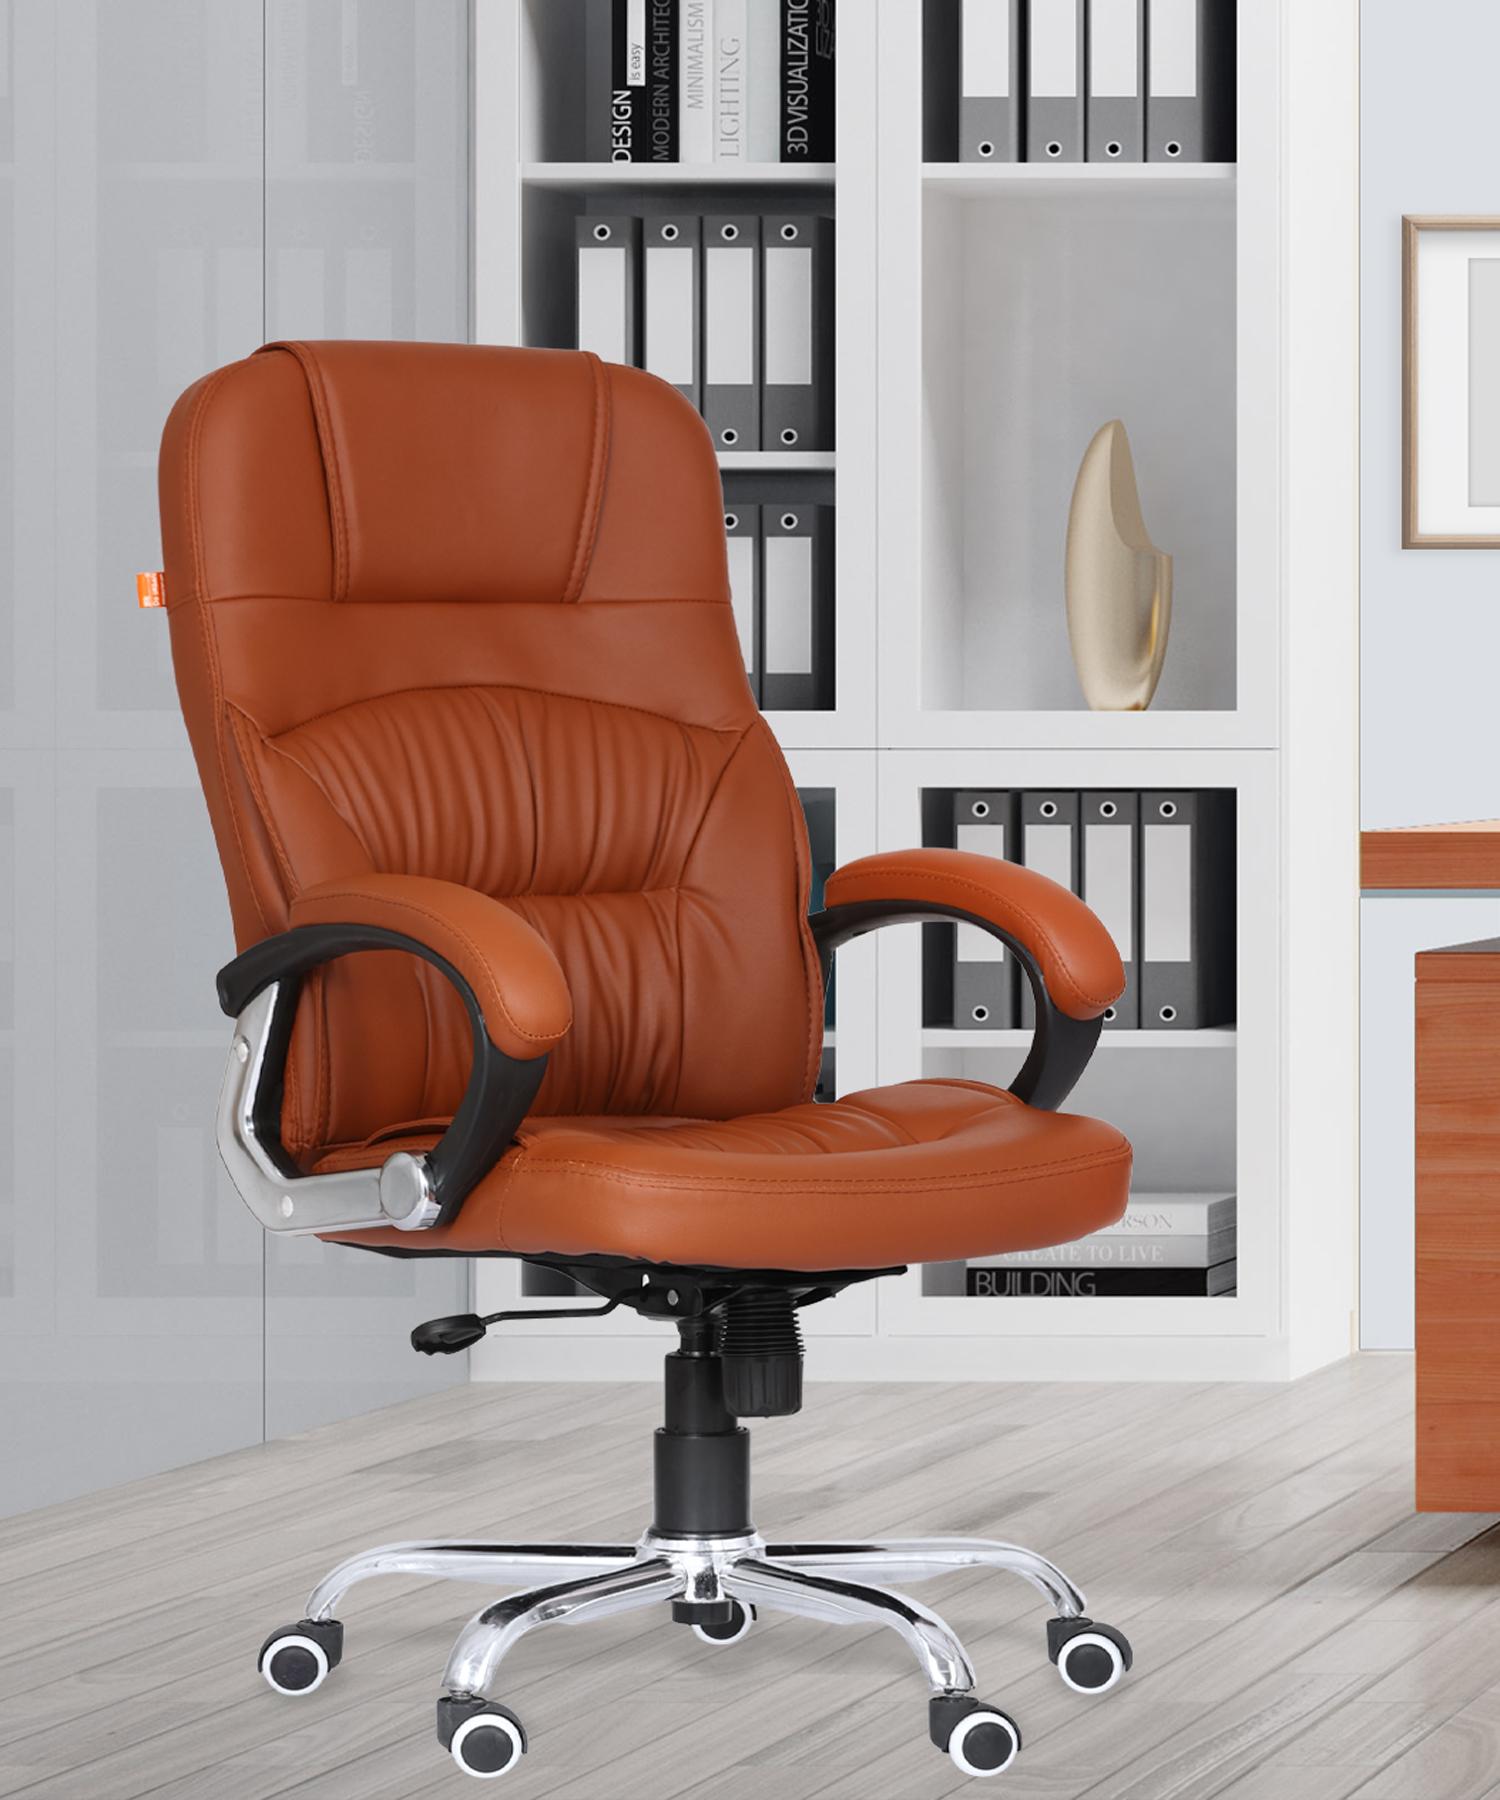 Da URBAN® Clayton Tan High-Back  Revolving Chair